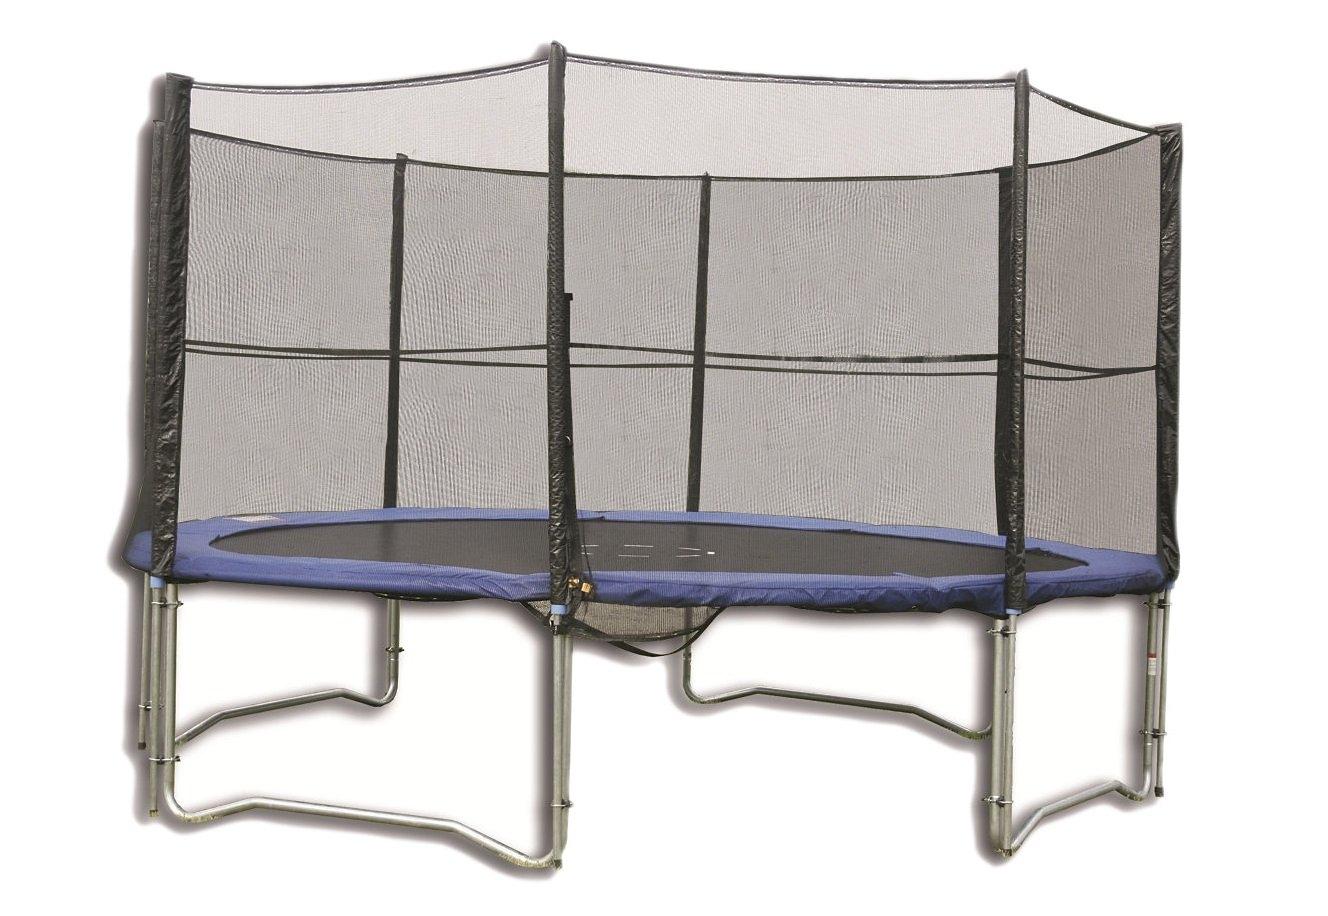 Spartan Sport Trampolinenet, Spartan, »vervangend net voor trampoline 305 cm Ø - Ø 460 cm«, in 5 afm. - gratis ruilen op otto.nl